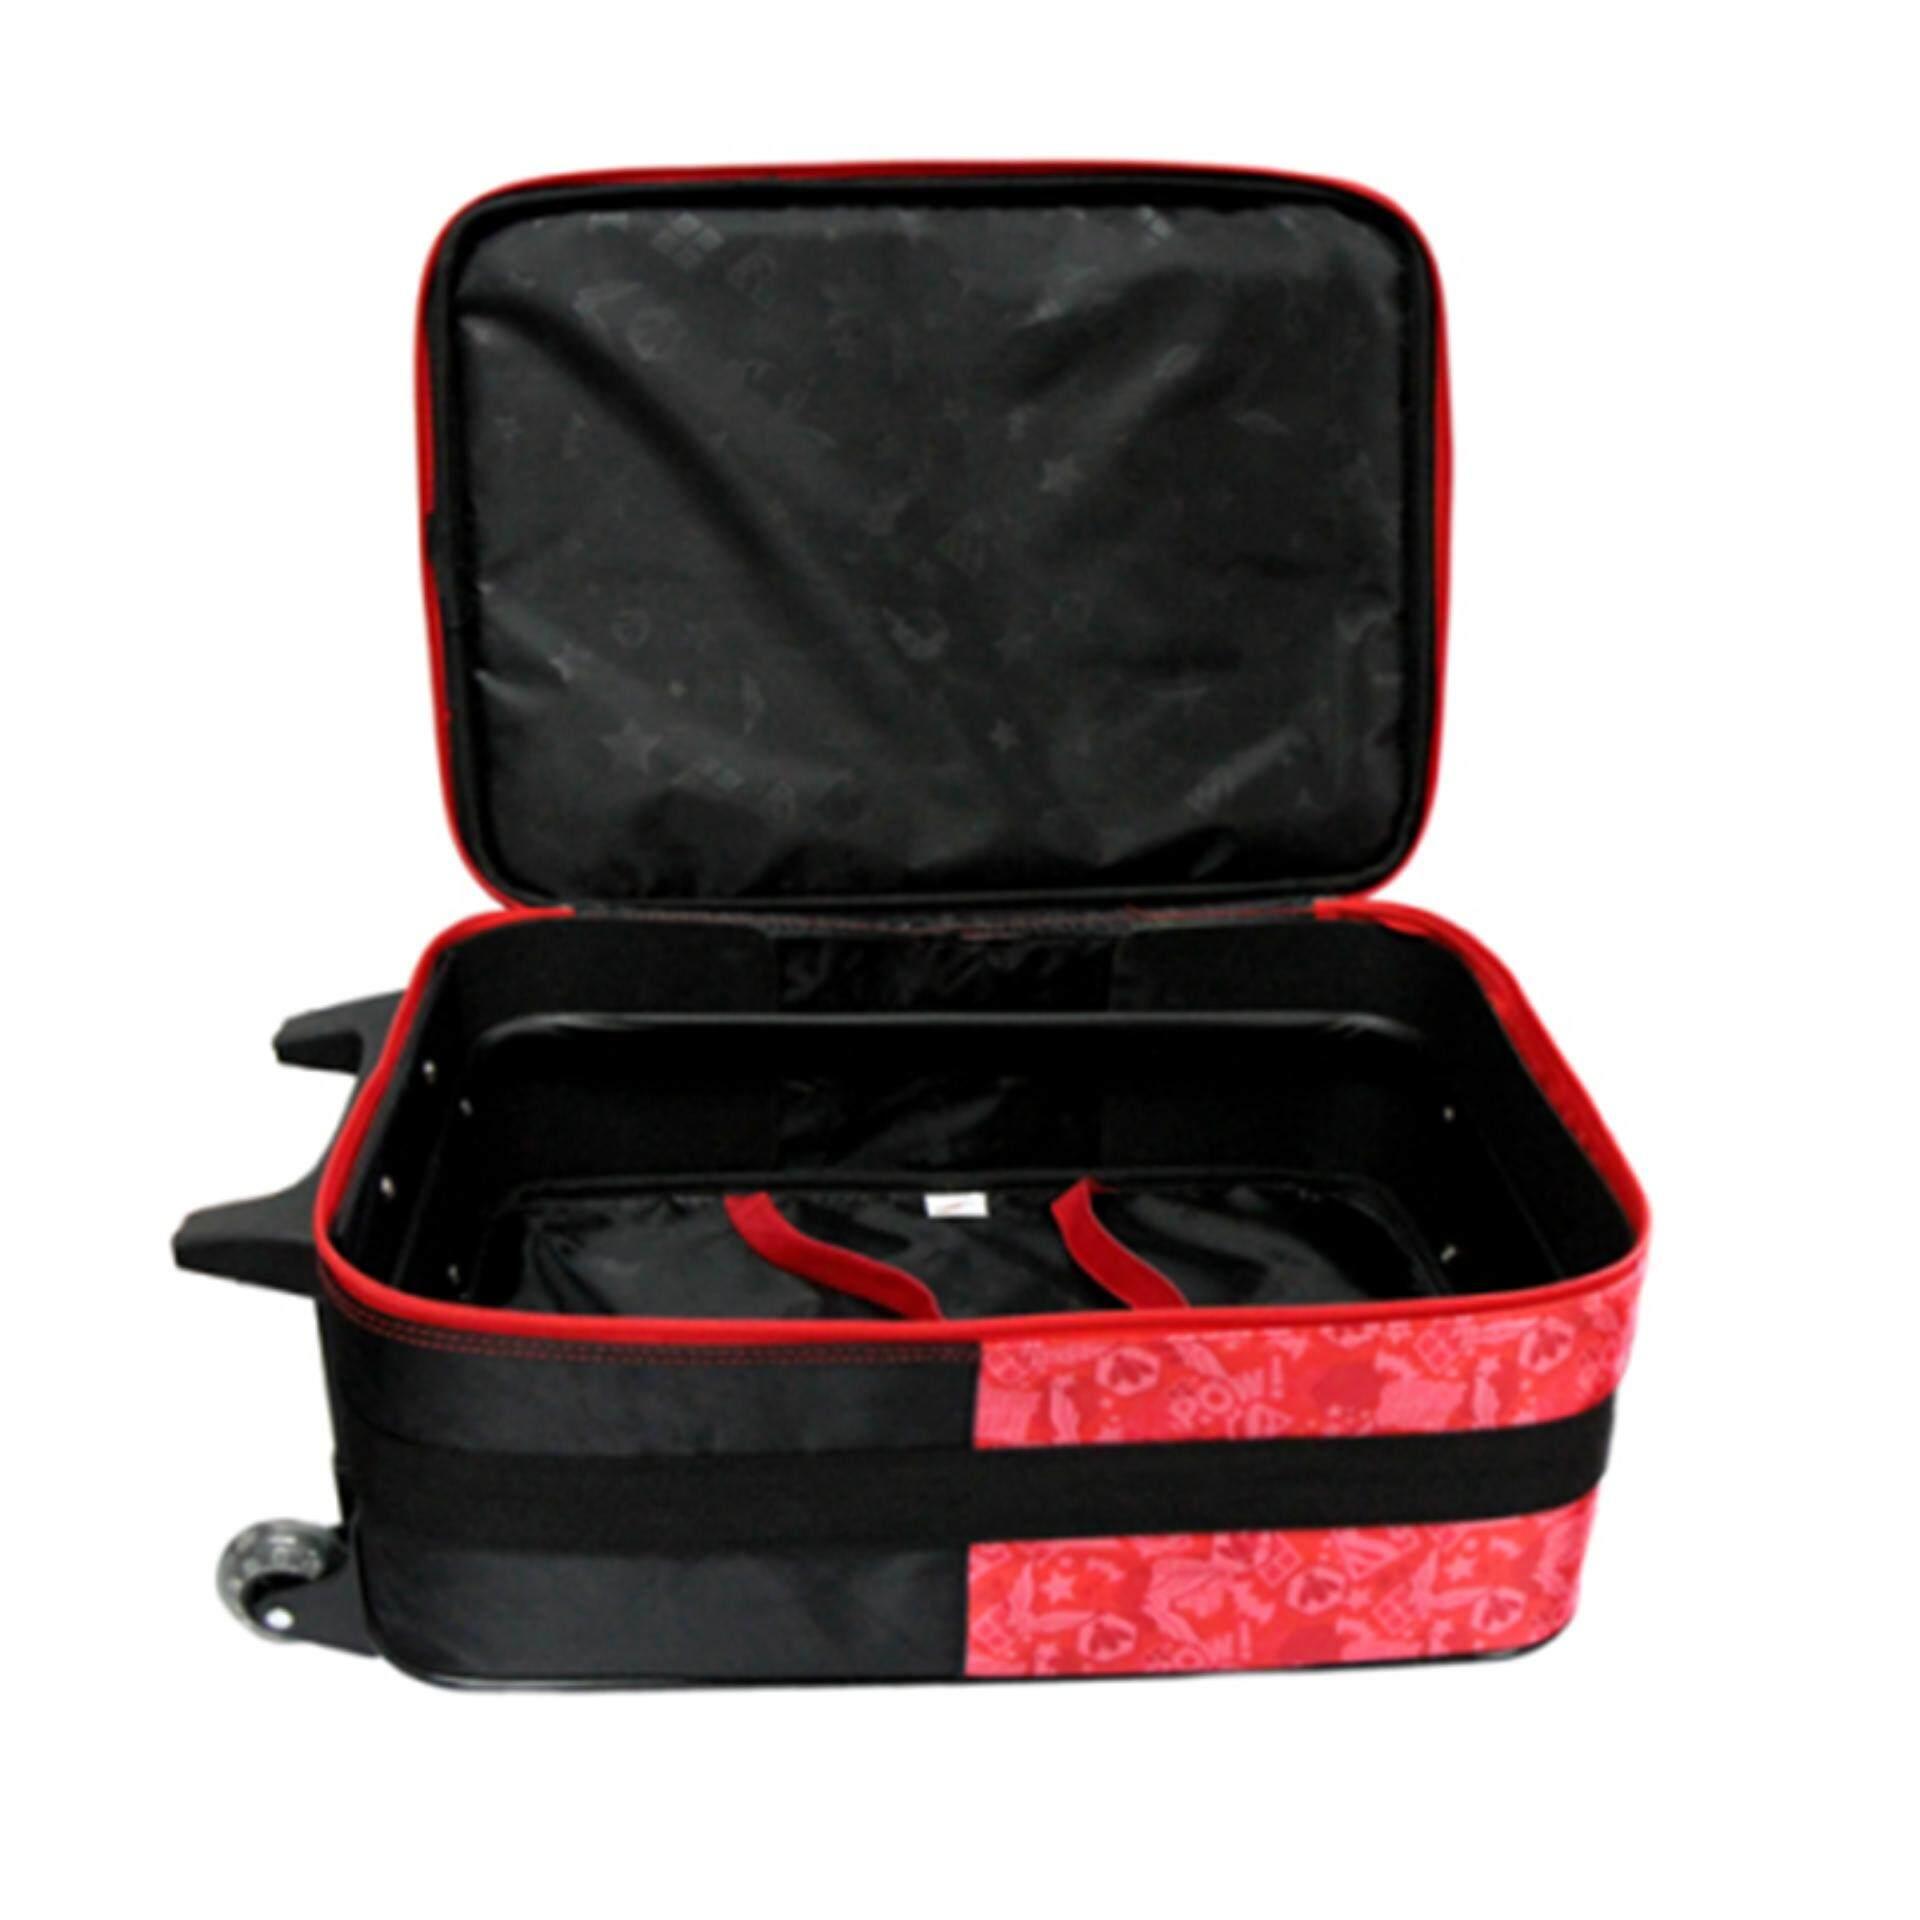 DC Comics Super Hero Girls Square Luggage Bag - Black Colour